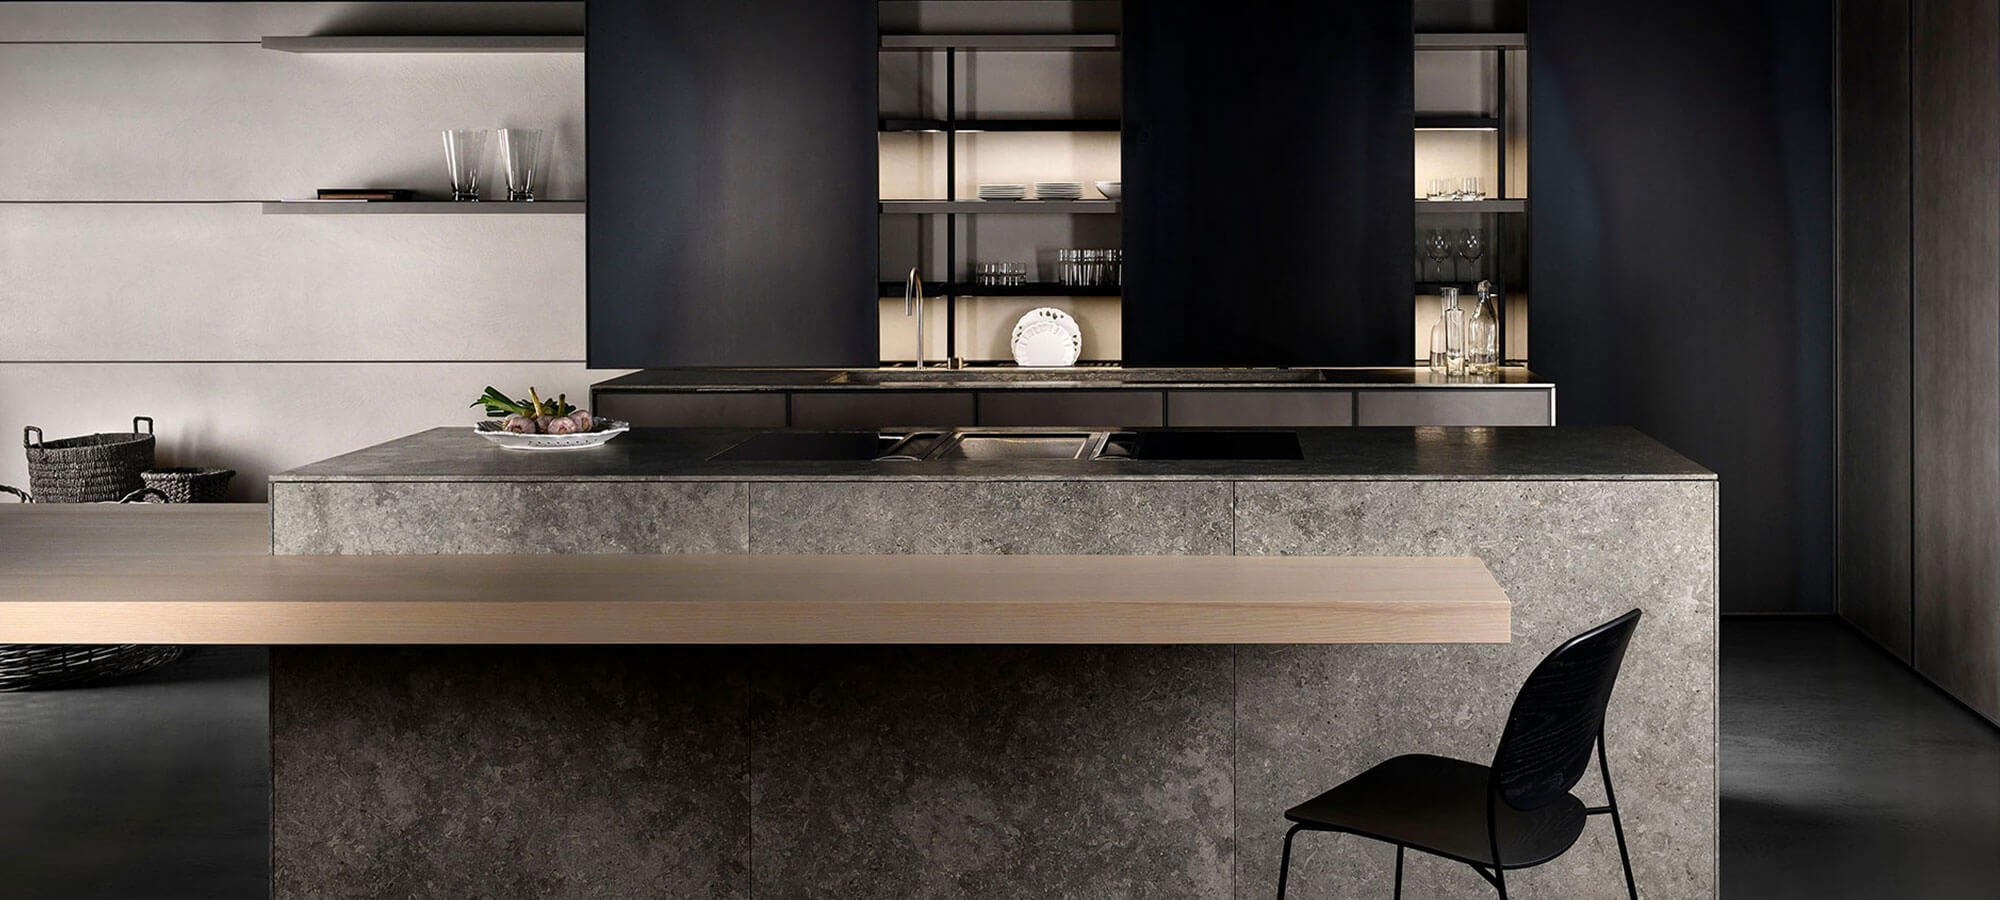 Nordic-Kitchen-002